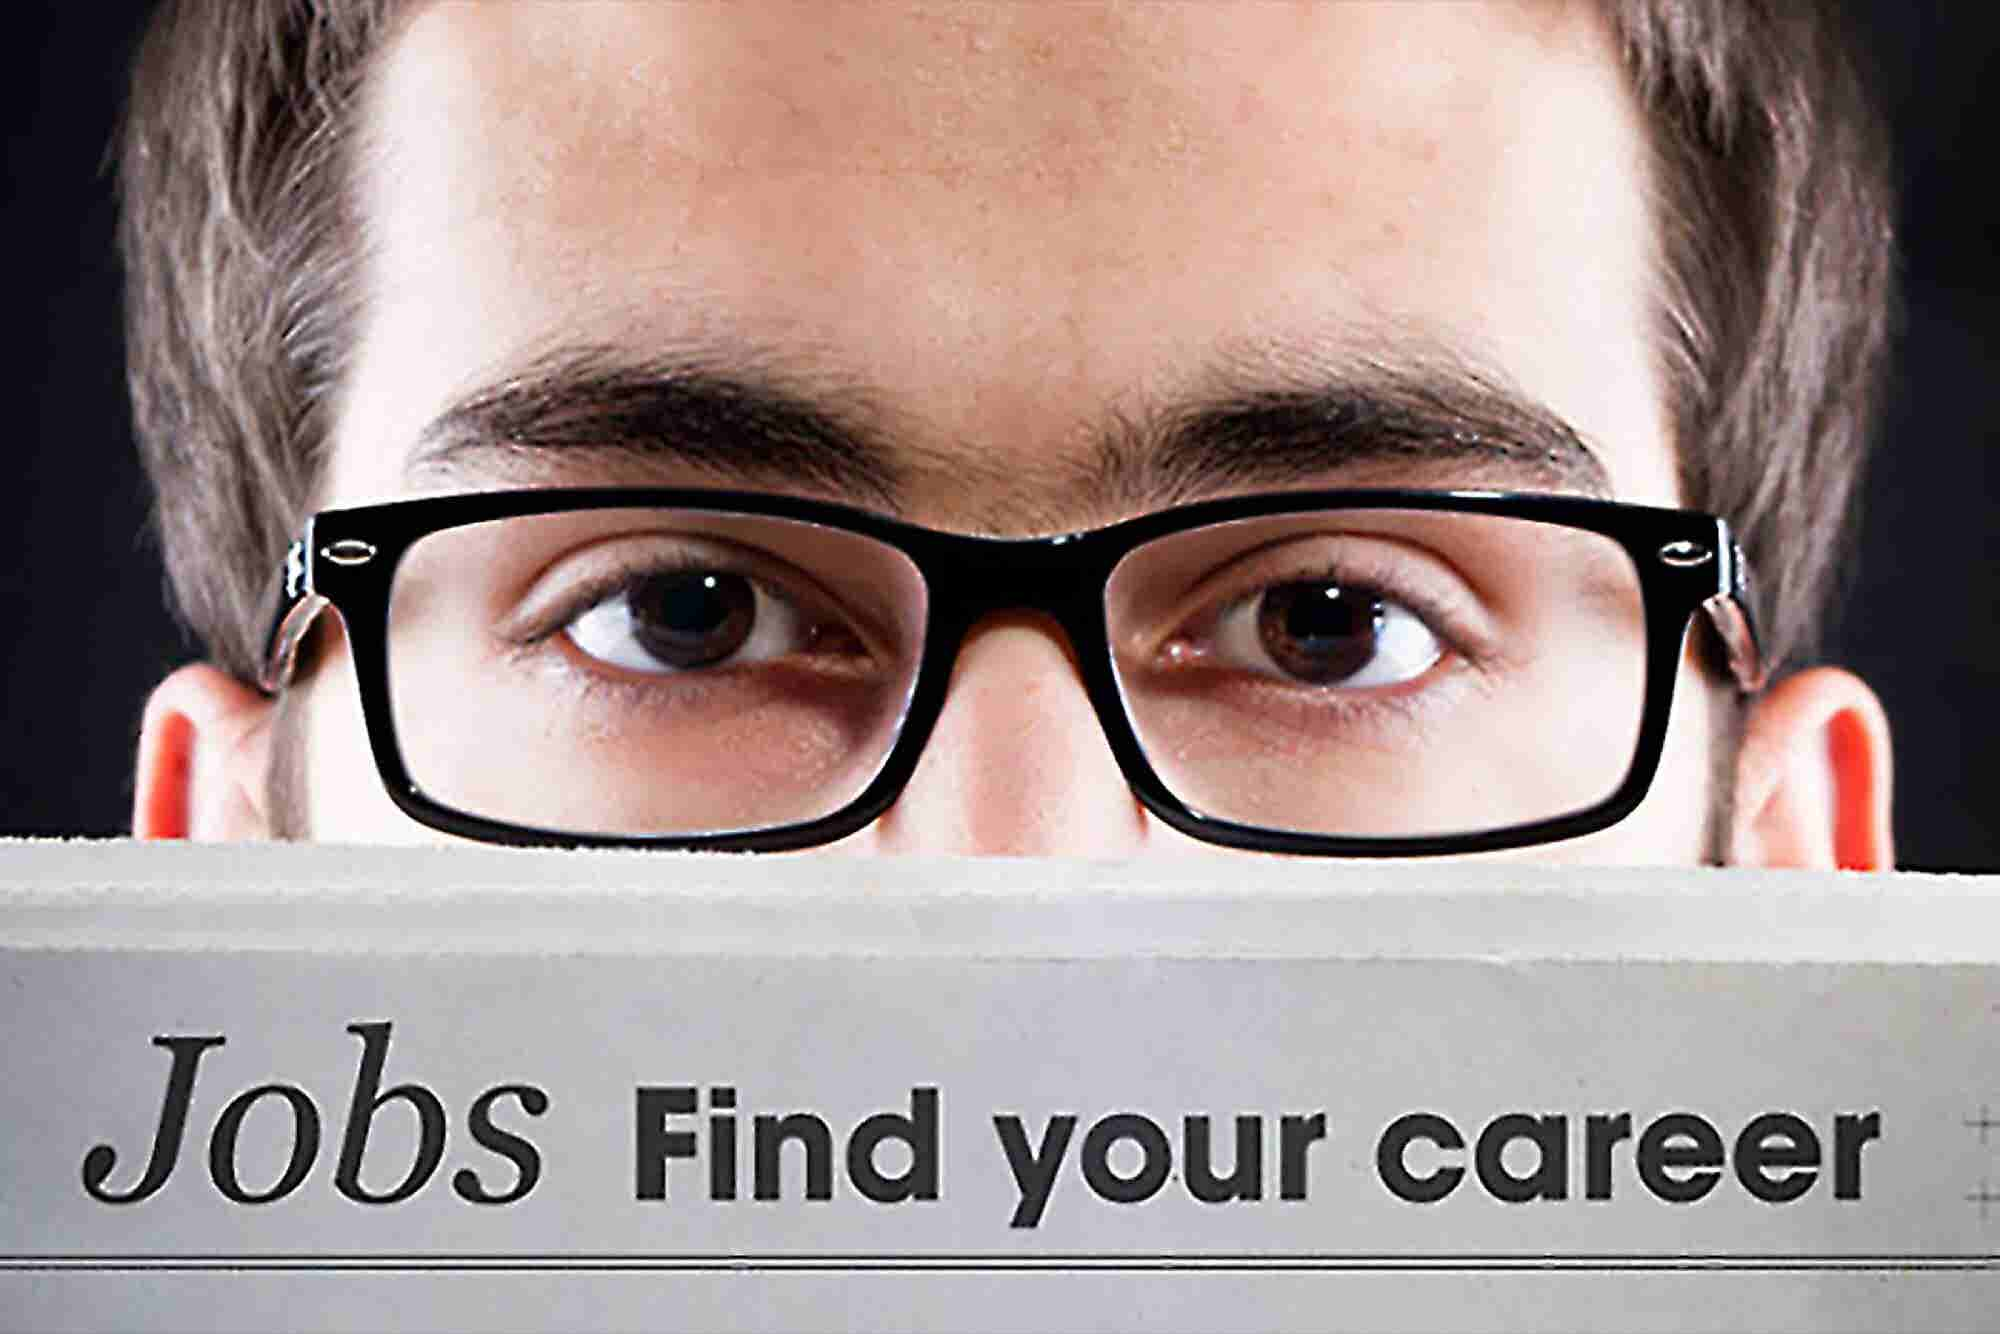 Want to Start Up? Get a Job First